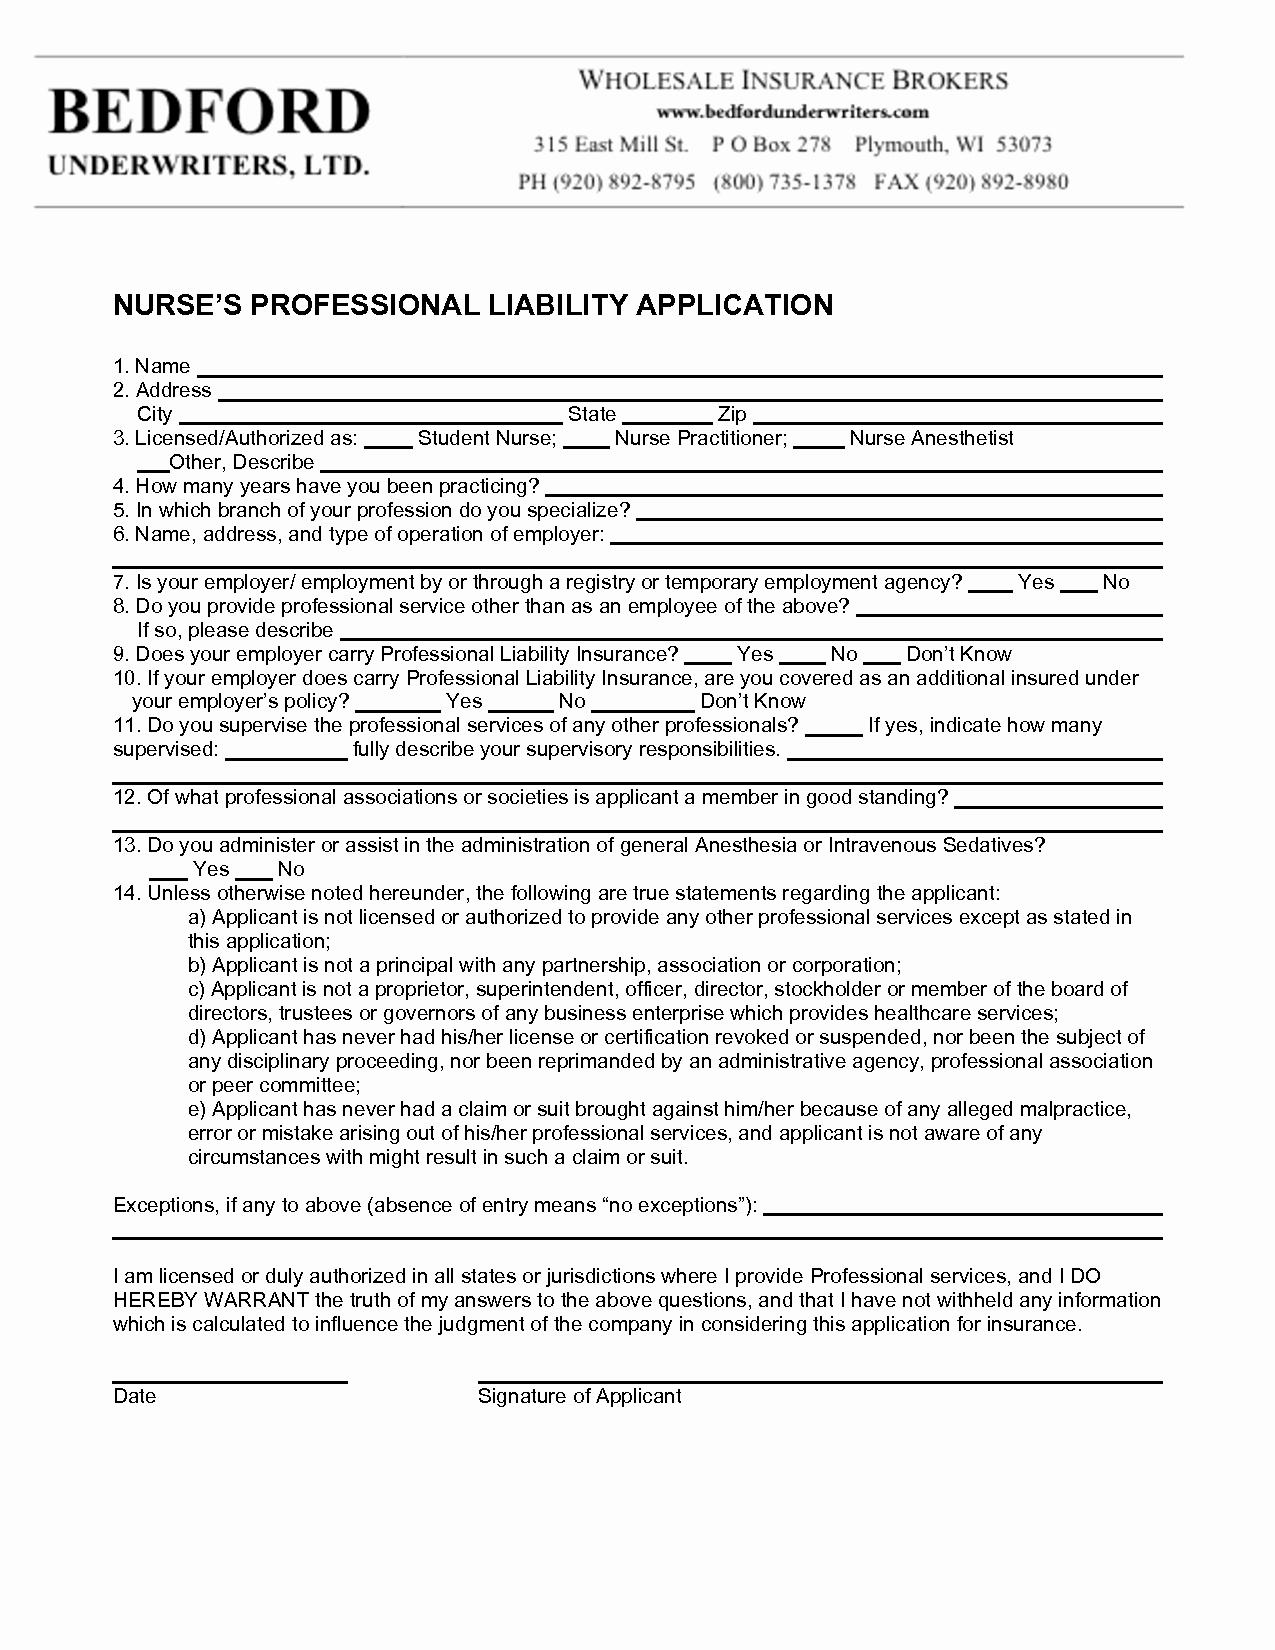 Sample Resume Nurse Practitioner Cover Letter Samples